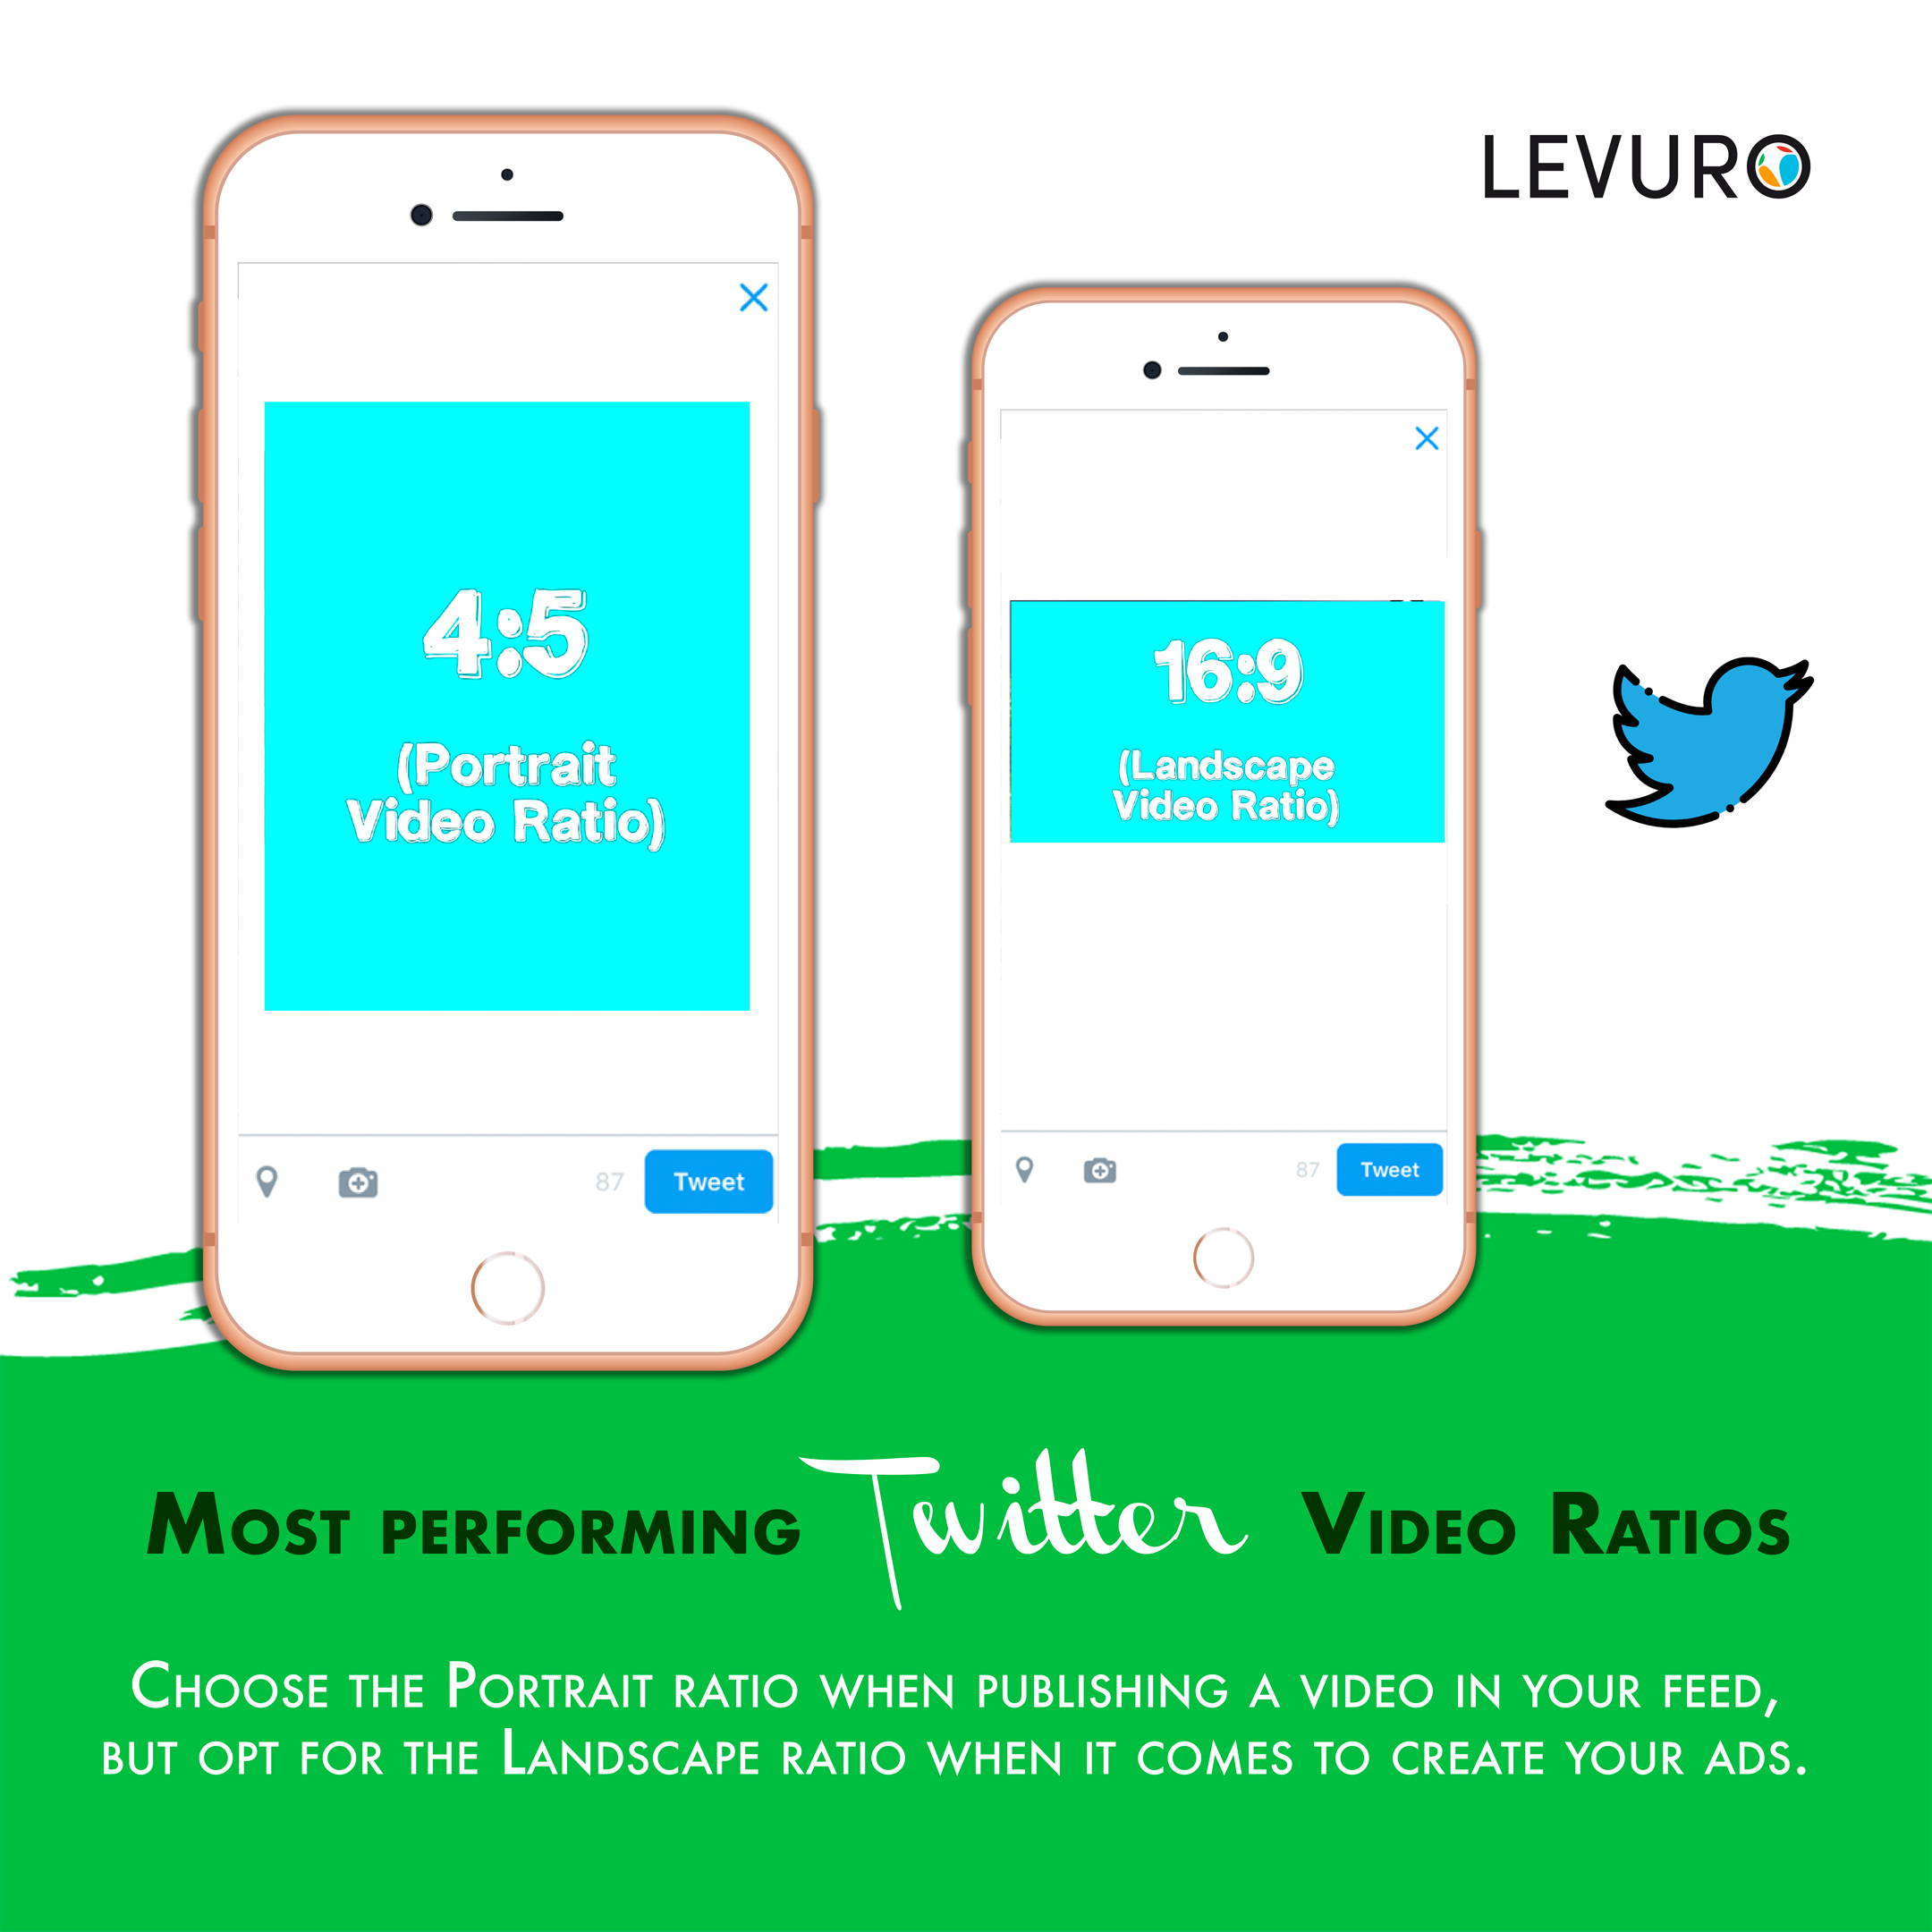 social media video editing - Levuro Engage